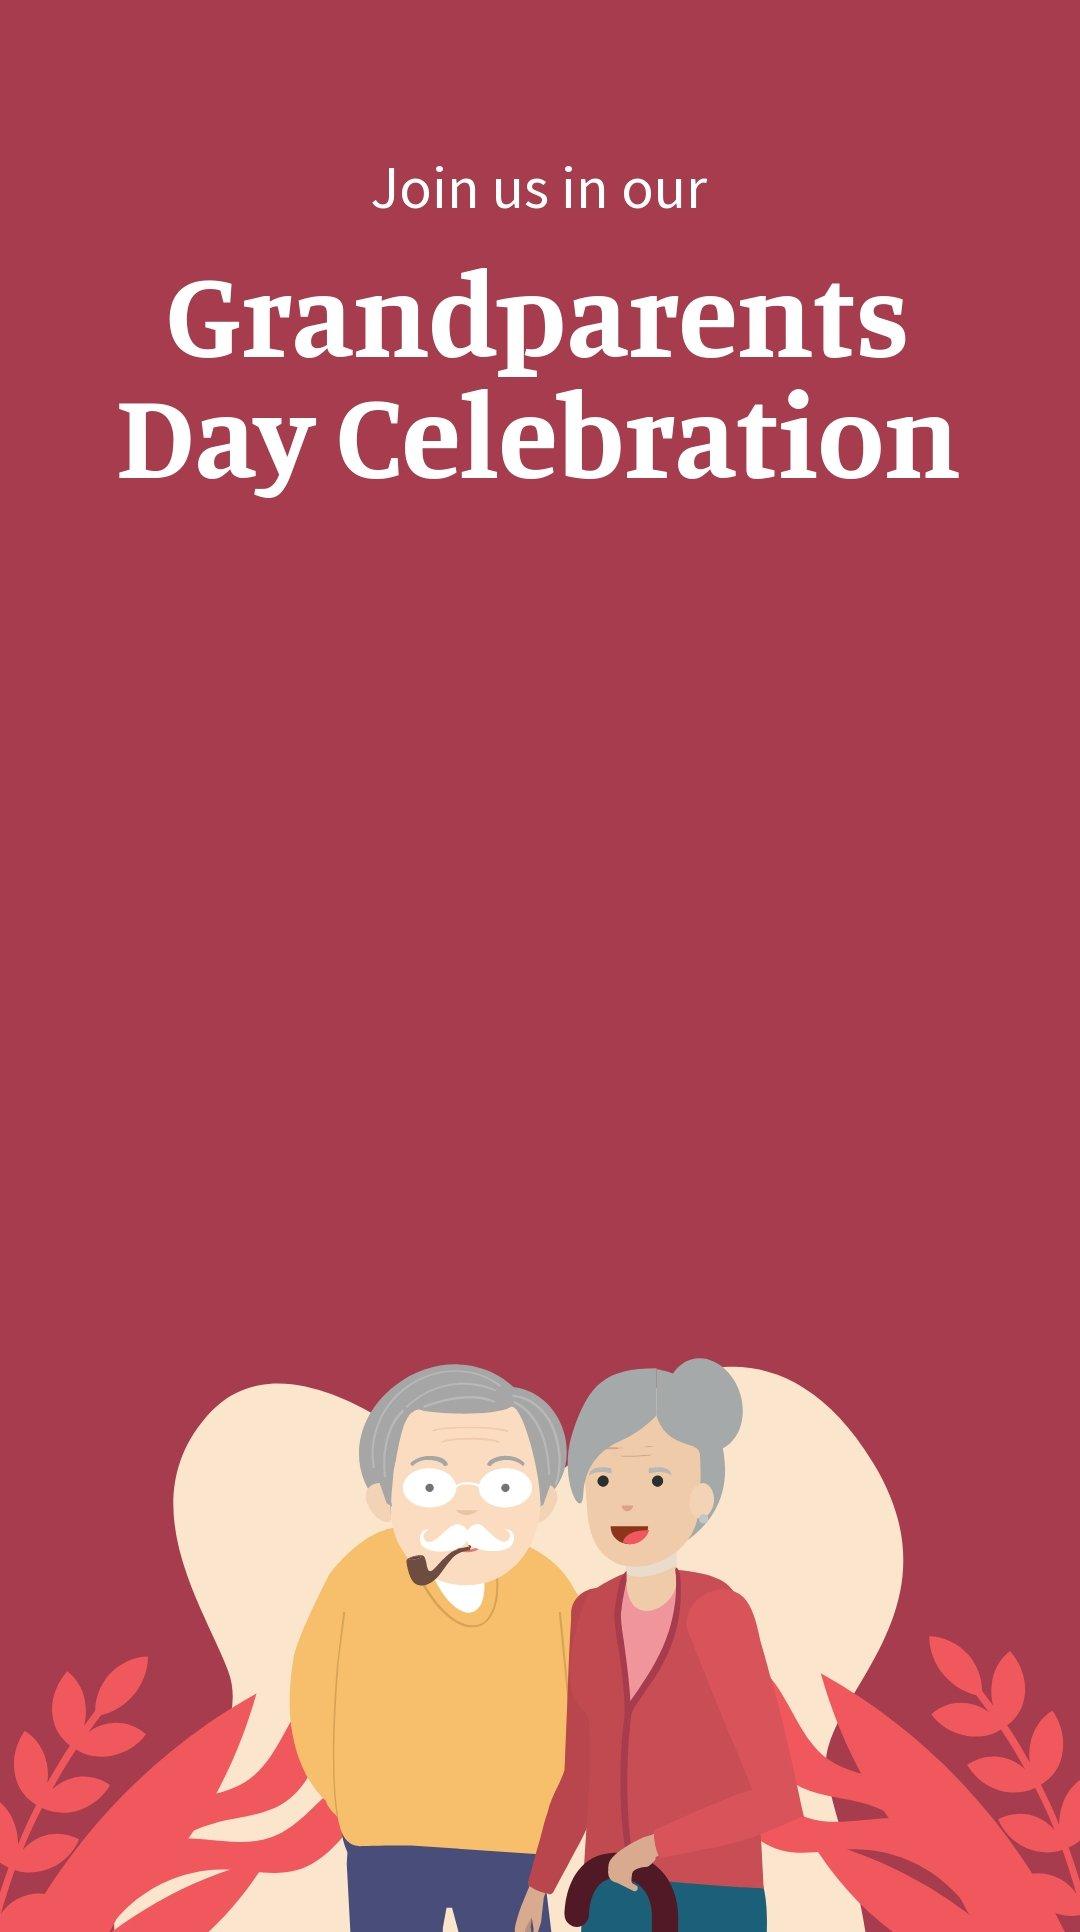 Grandparents Day Invitation Snapchat Geofilter Template.jpe